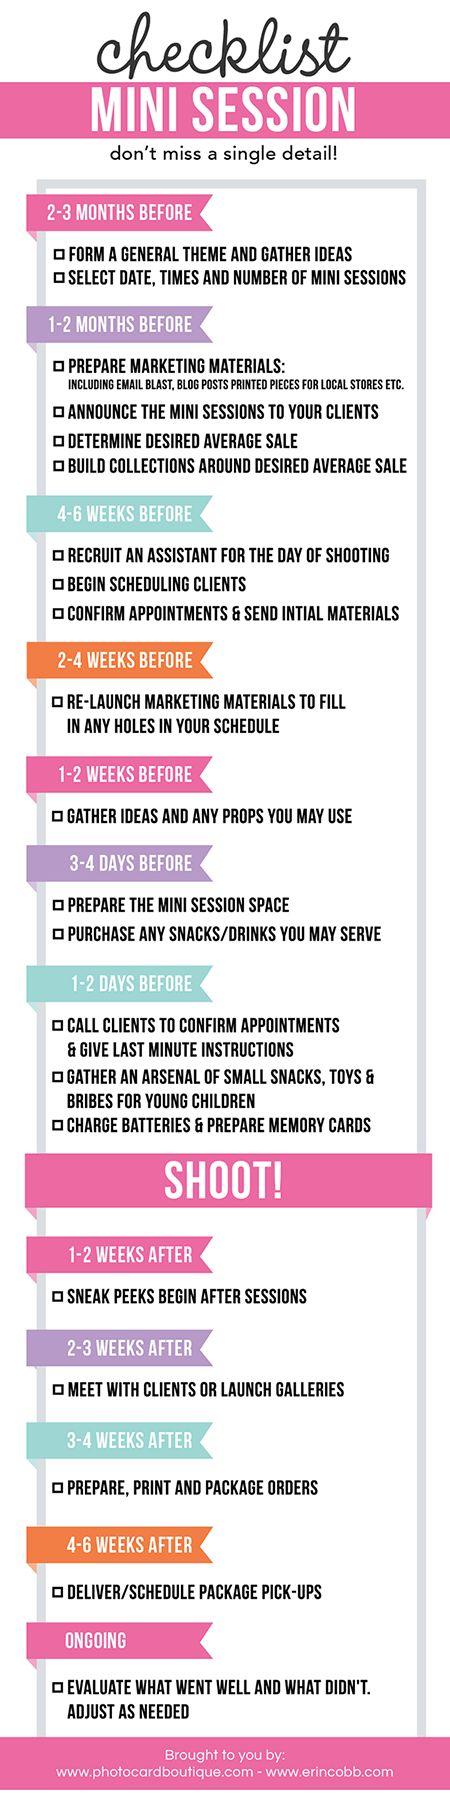 Free - Photographers Mini Session Checklist